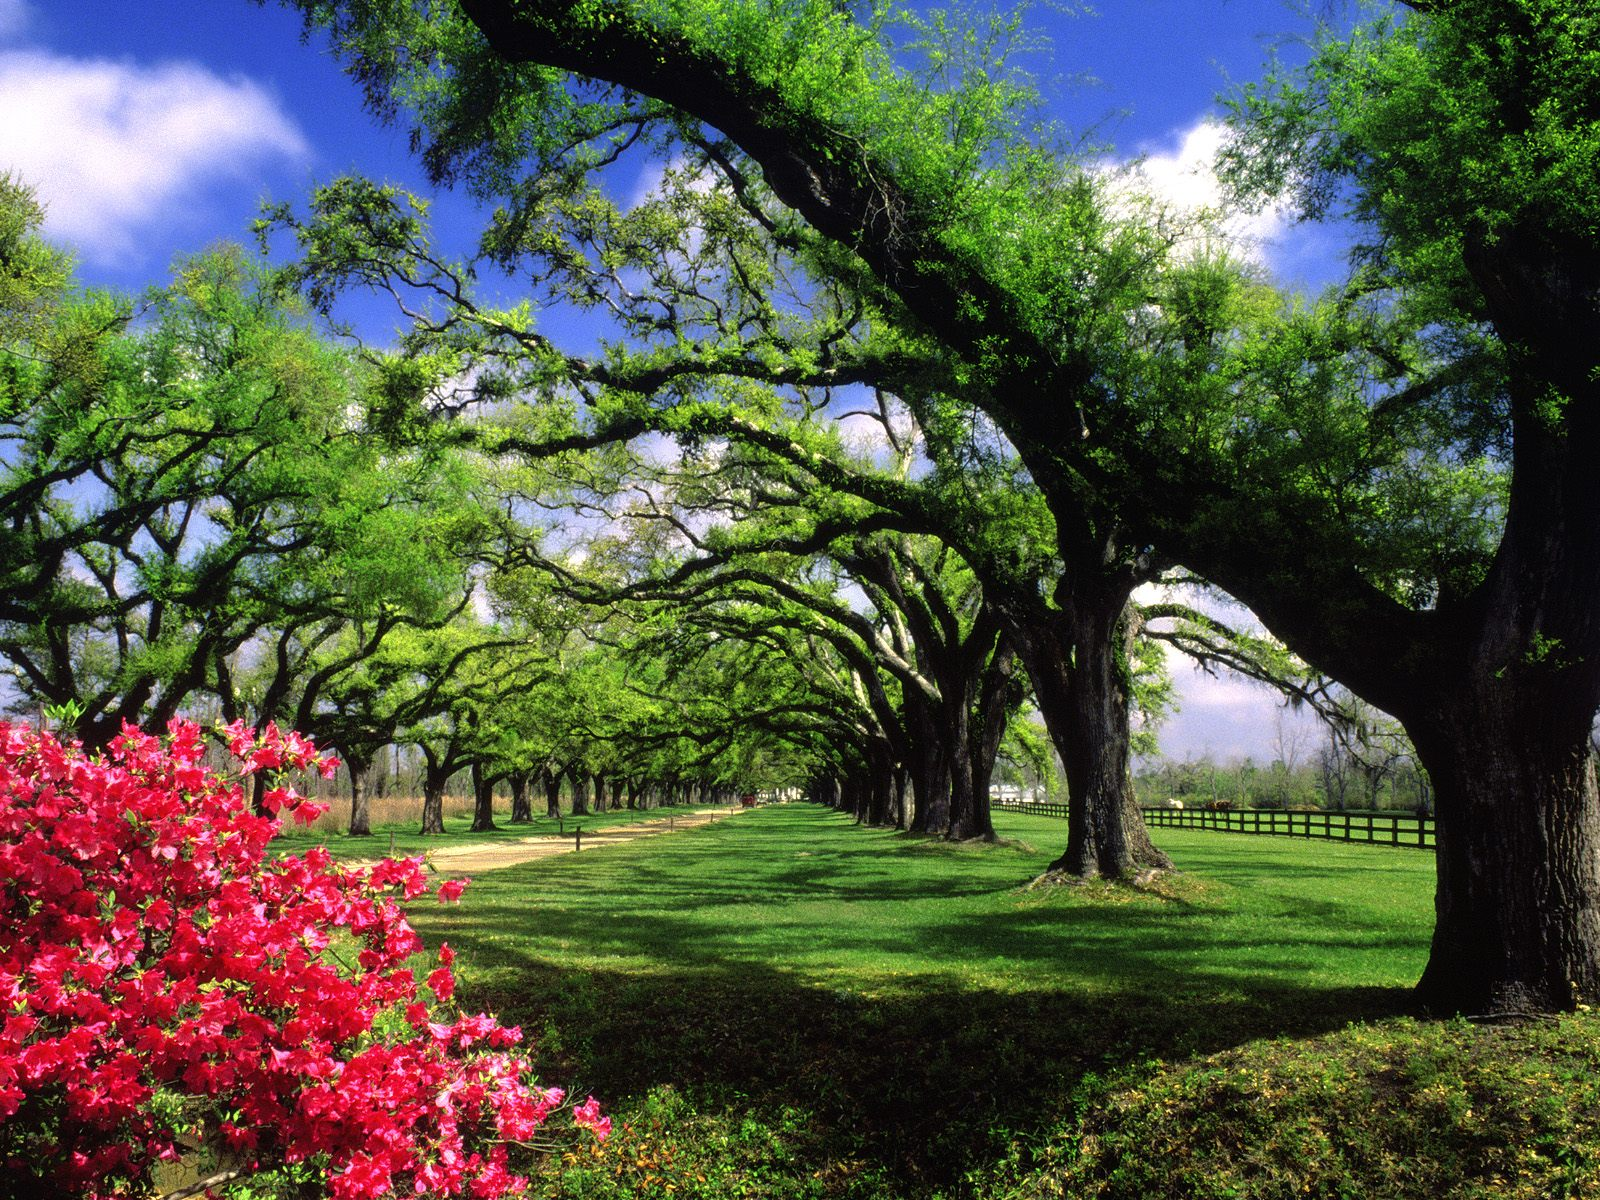 wallpapers boone hall plantation south carolina tags tree south 1600x1200